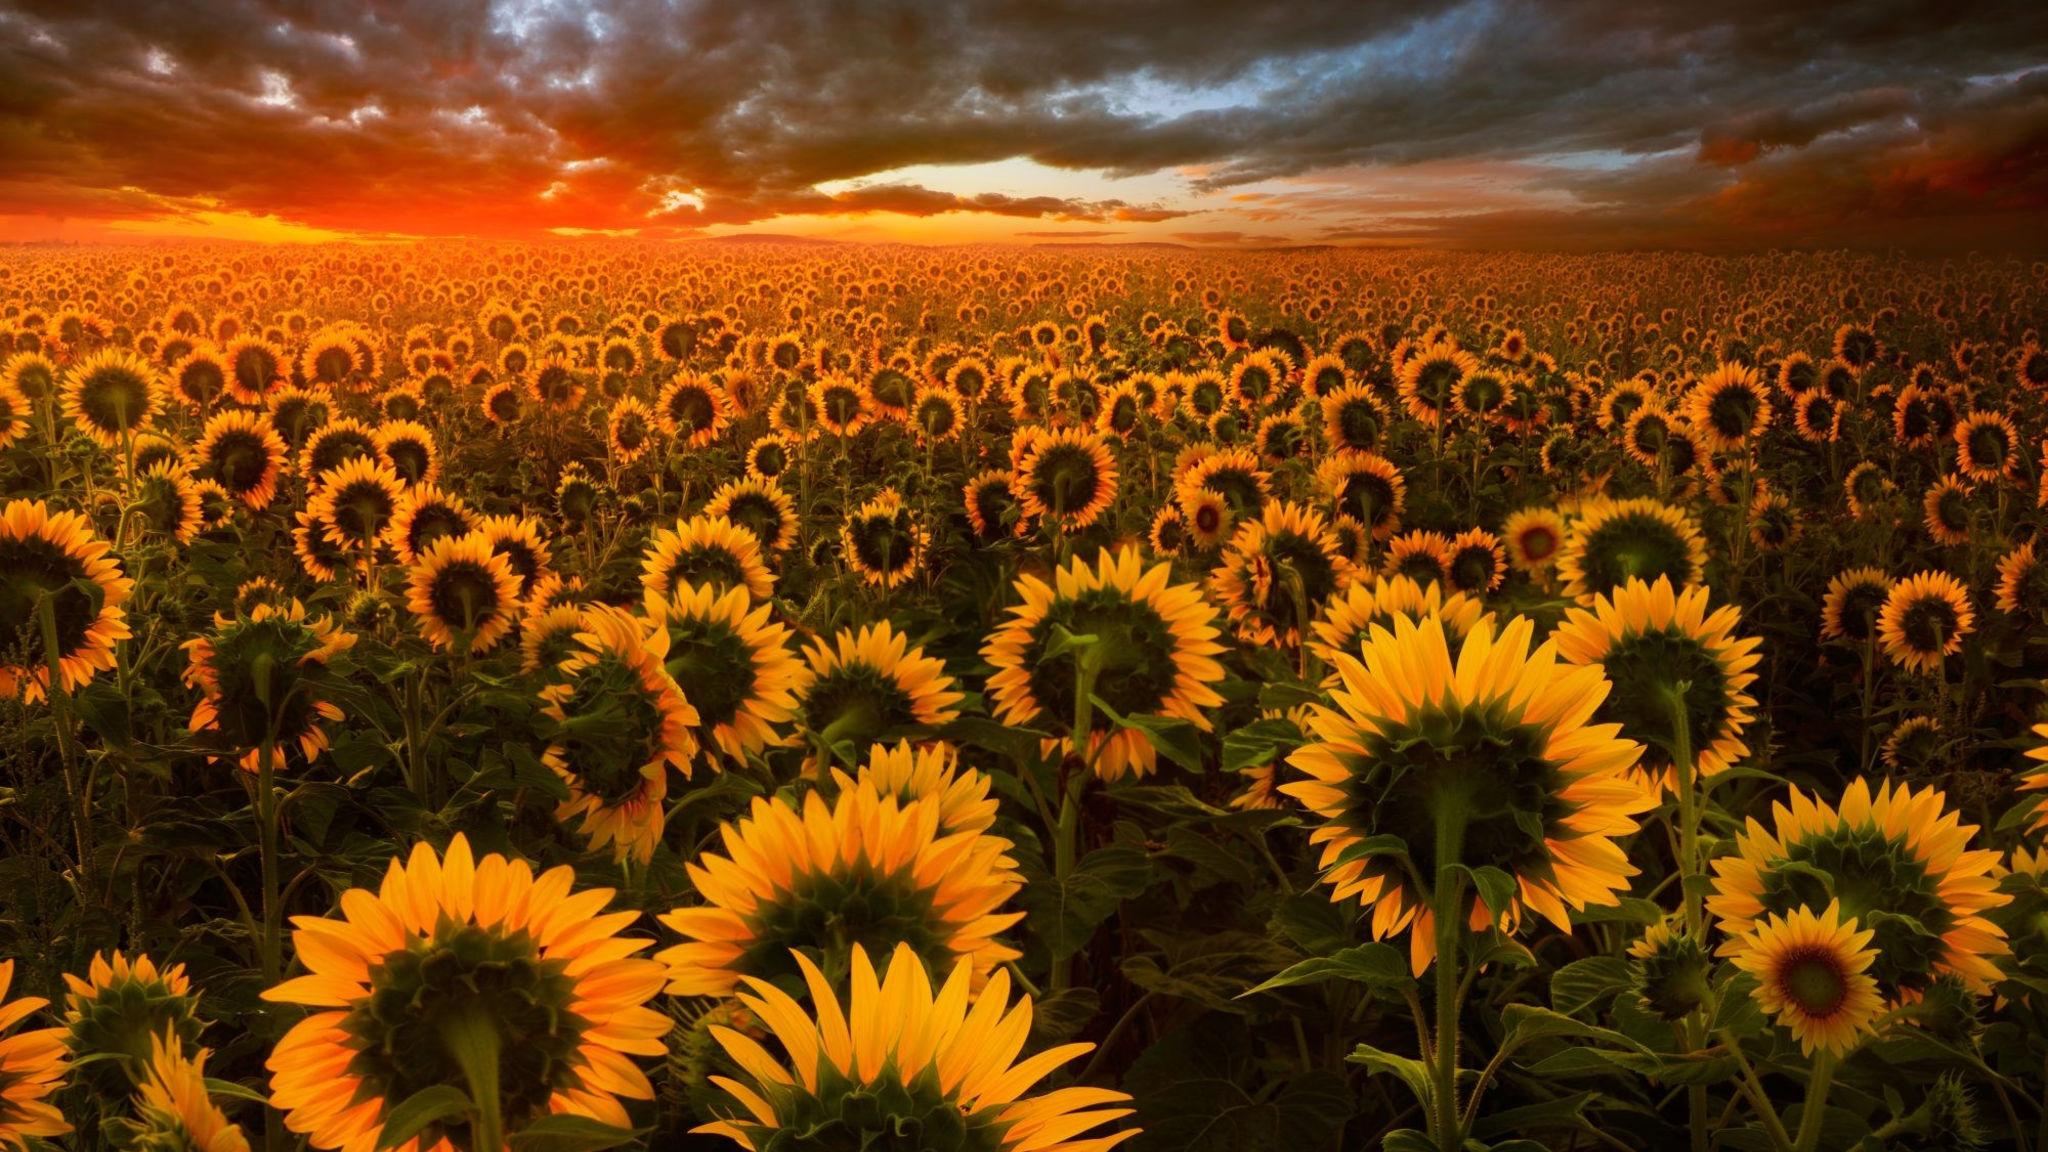 2048x1152 Sunflower Field 2048x1152 Resolution HD 4k Wallpapers ...